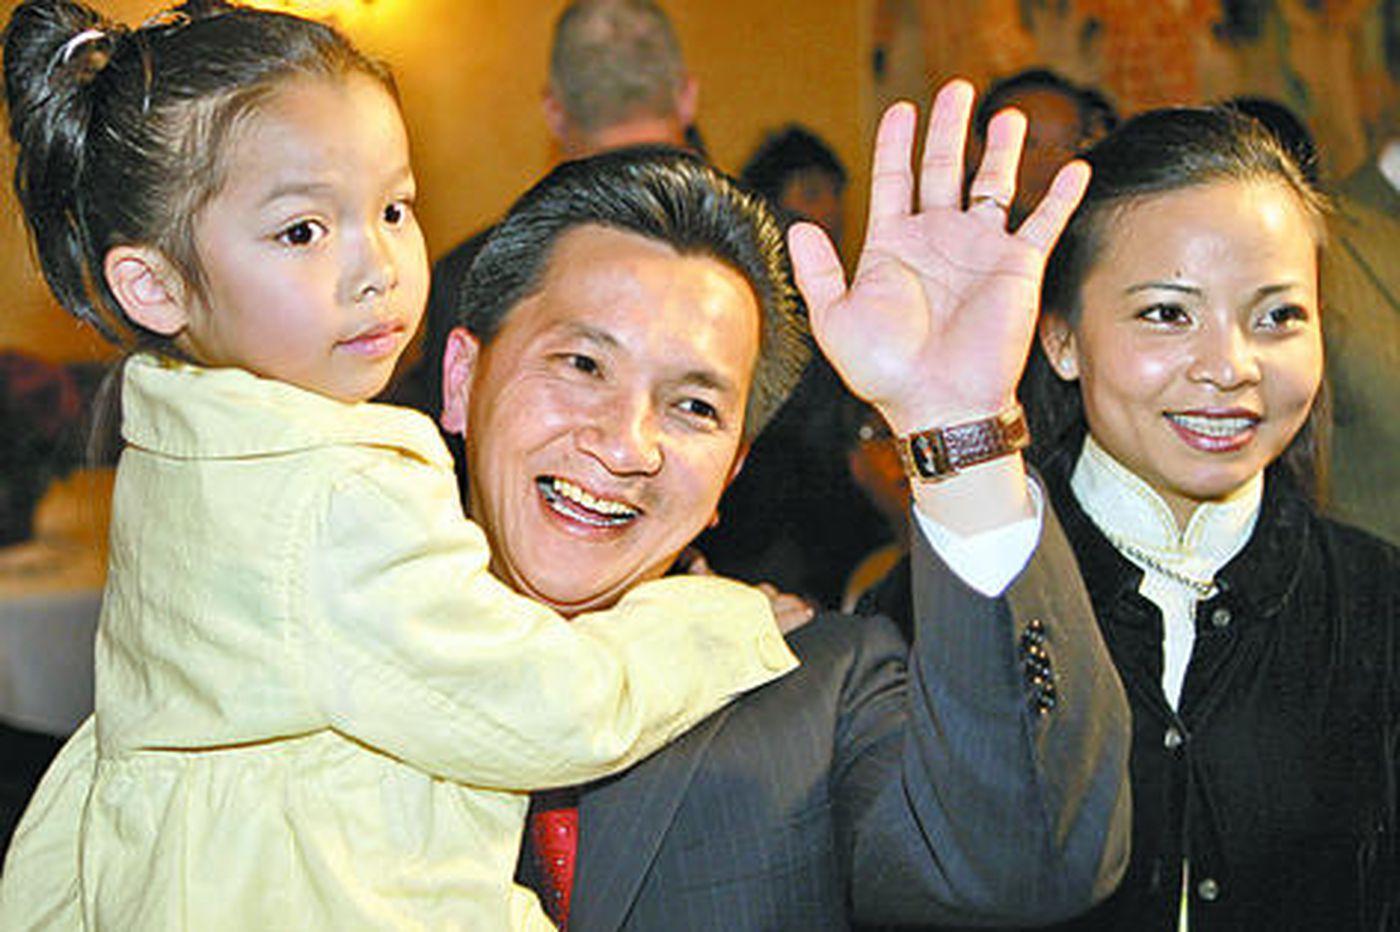 La. sends two more GOP to Congress